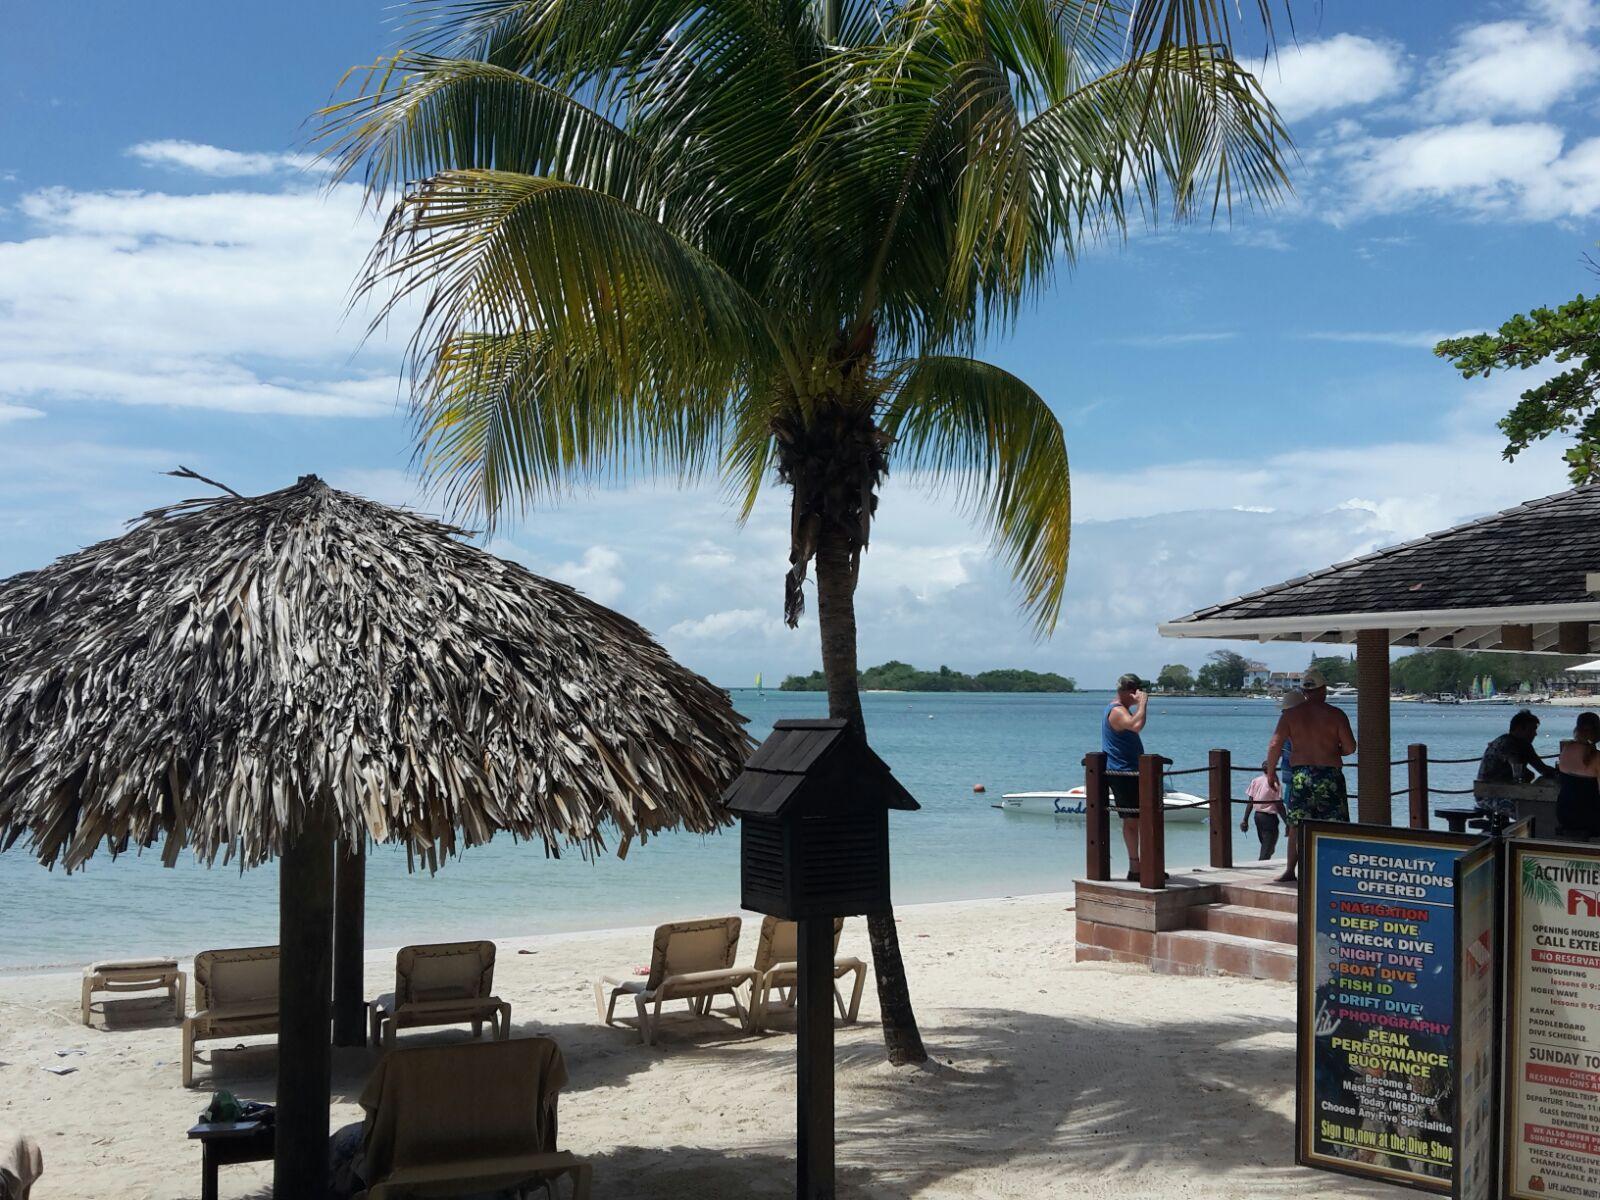 jamaican tourist board information